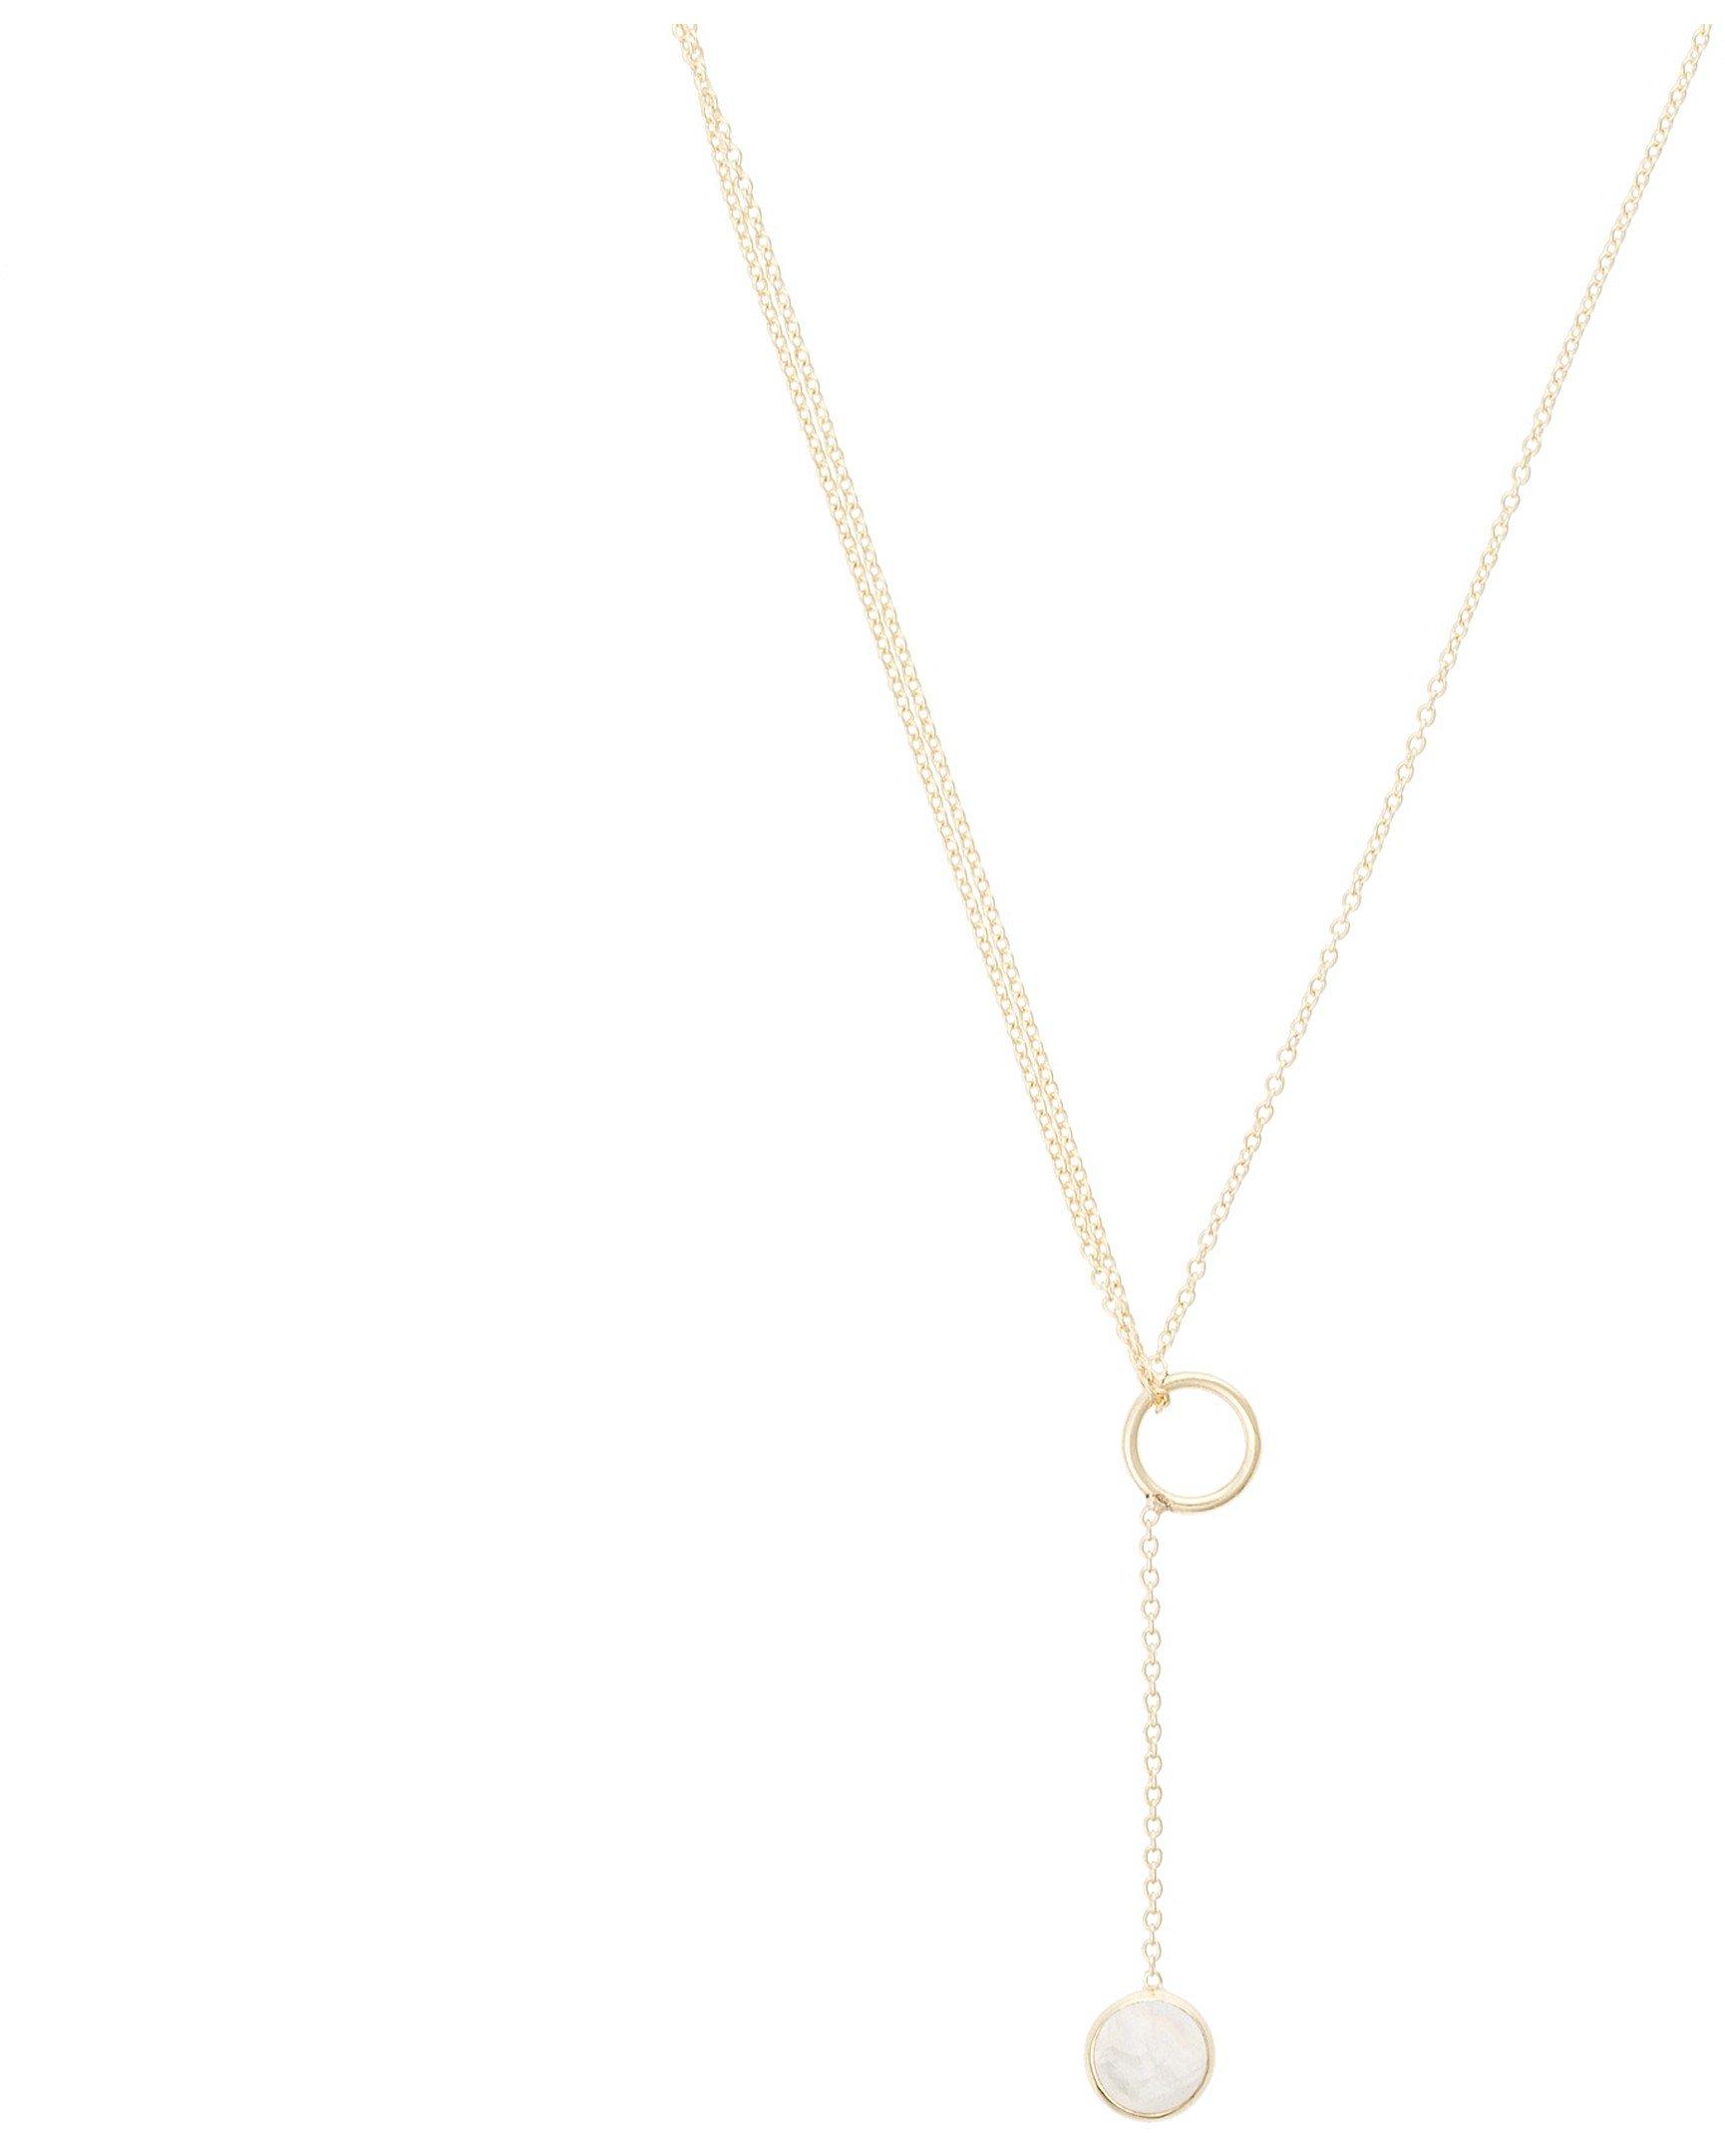 886cfb240f8dc Necklaces & Pendant Necklaces for Women | Oliver Bonas